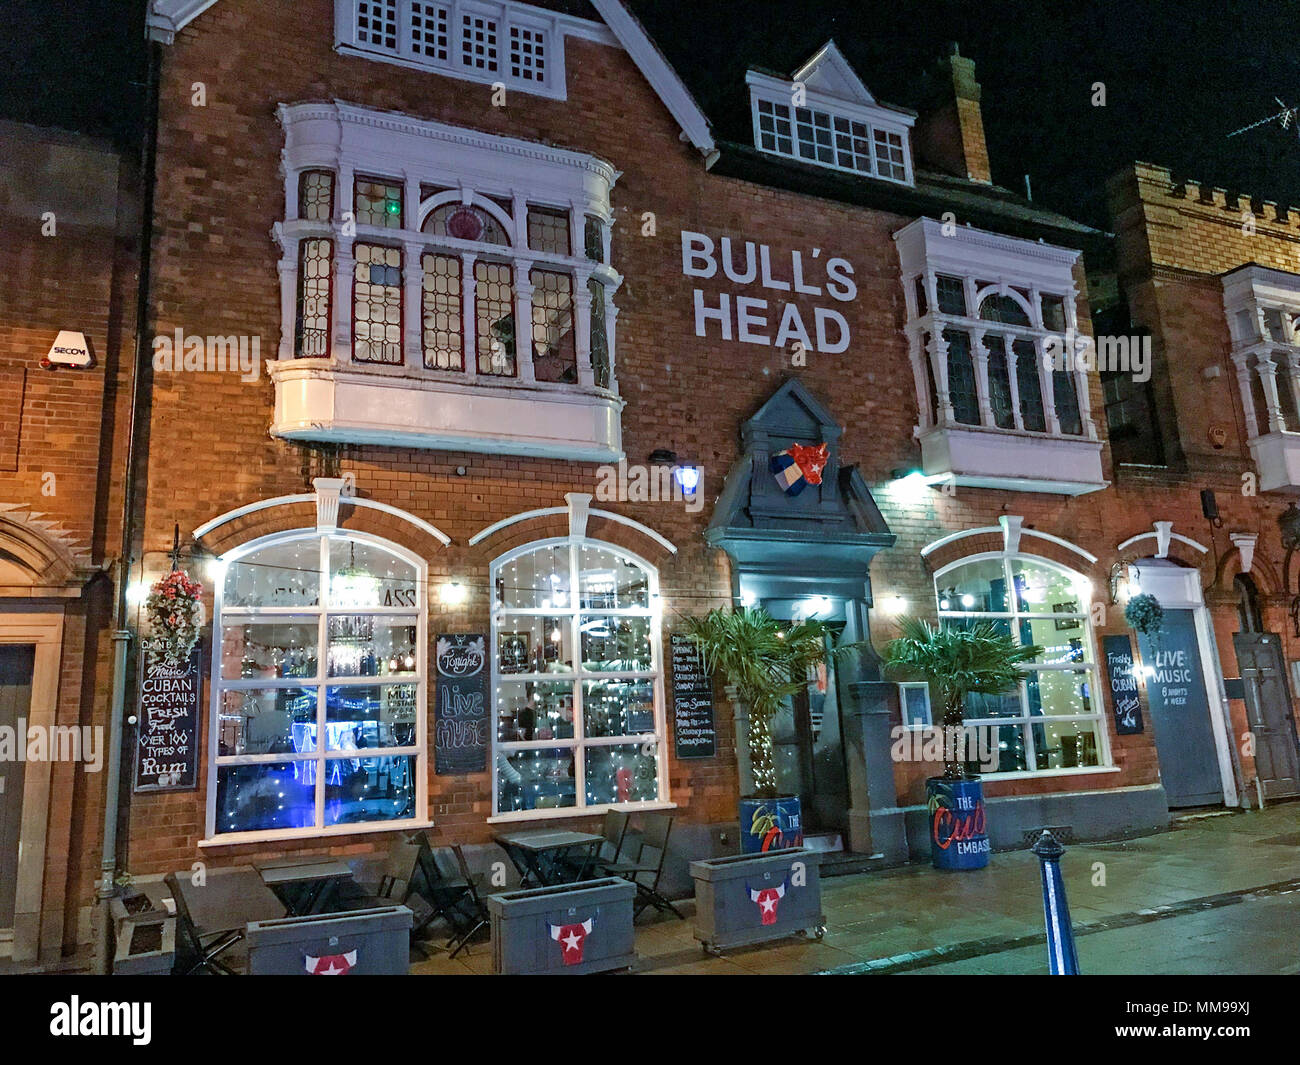 Bulls Head pub at night, 19 St Mary's Row, Moseley, Birmingham B13 8HW, UK - Stock Image